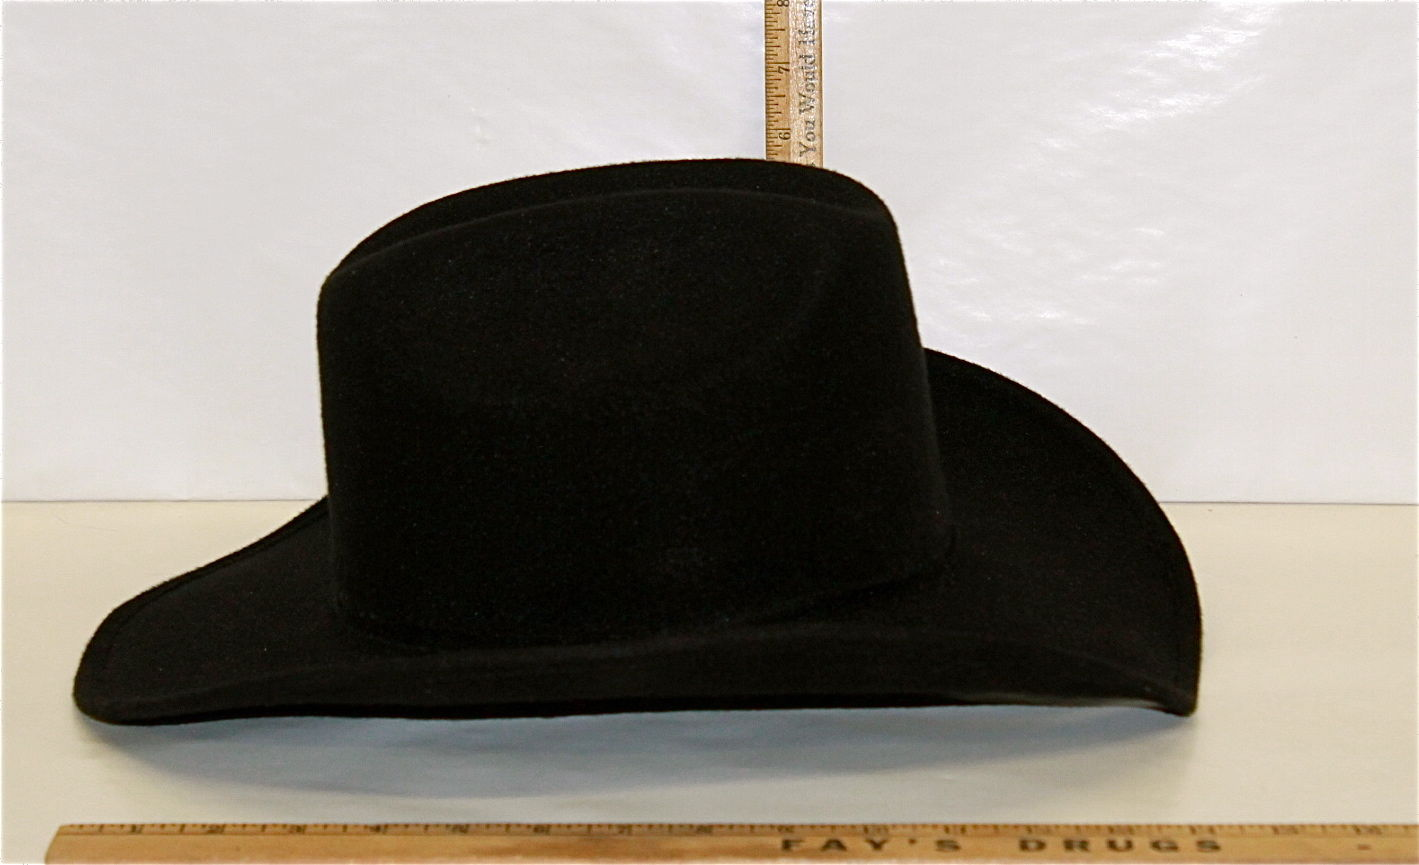 d1f42b98c3e S l1600. S l1600. Previous. Men s Black Western Cowboy Hat Pigalle Santo  Nino Sombrero Mexico Felt Lg 7 3 8